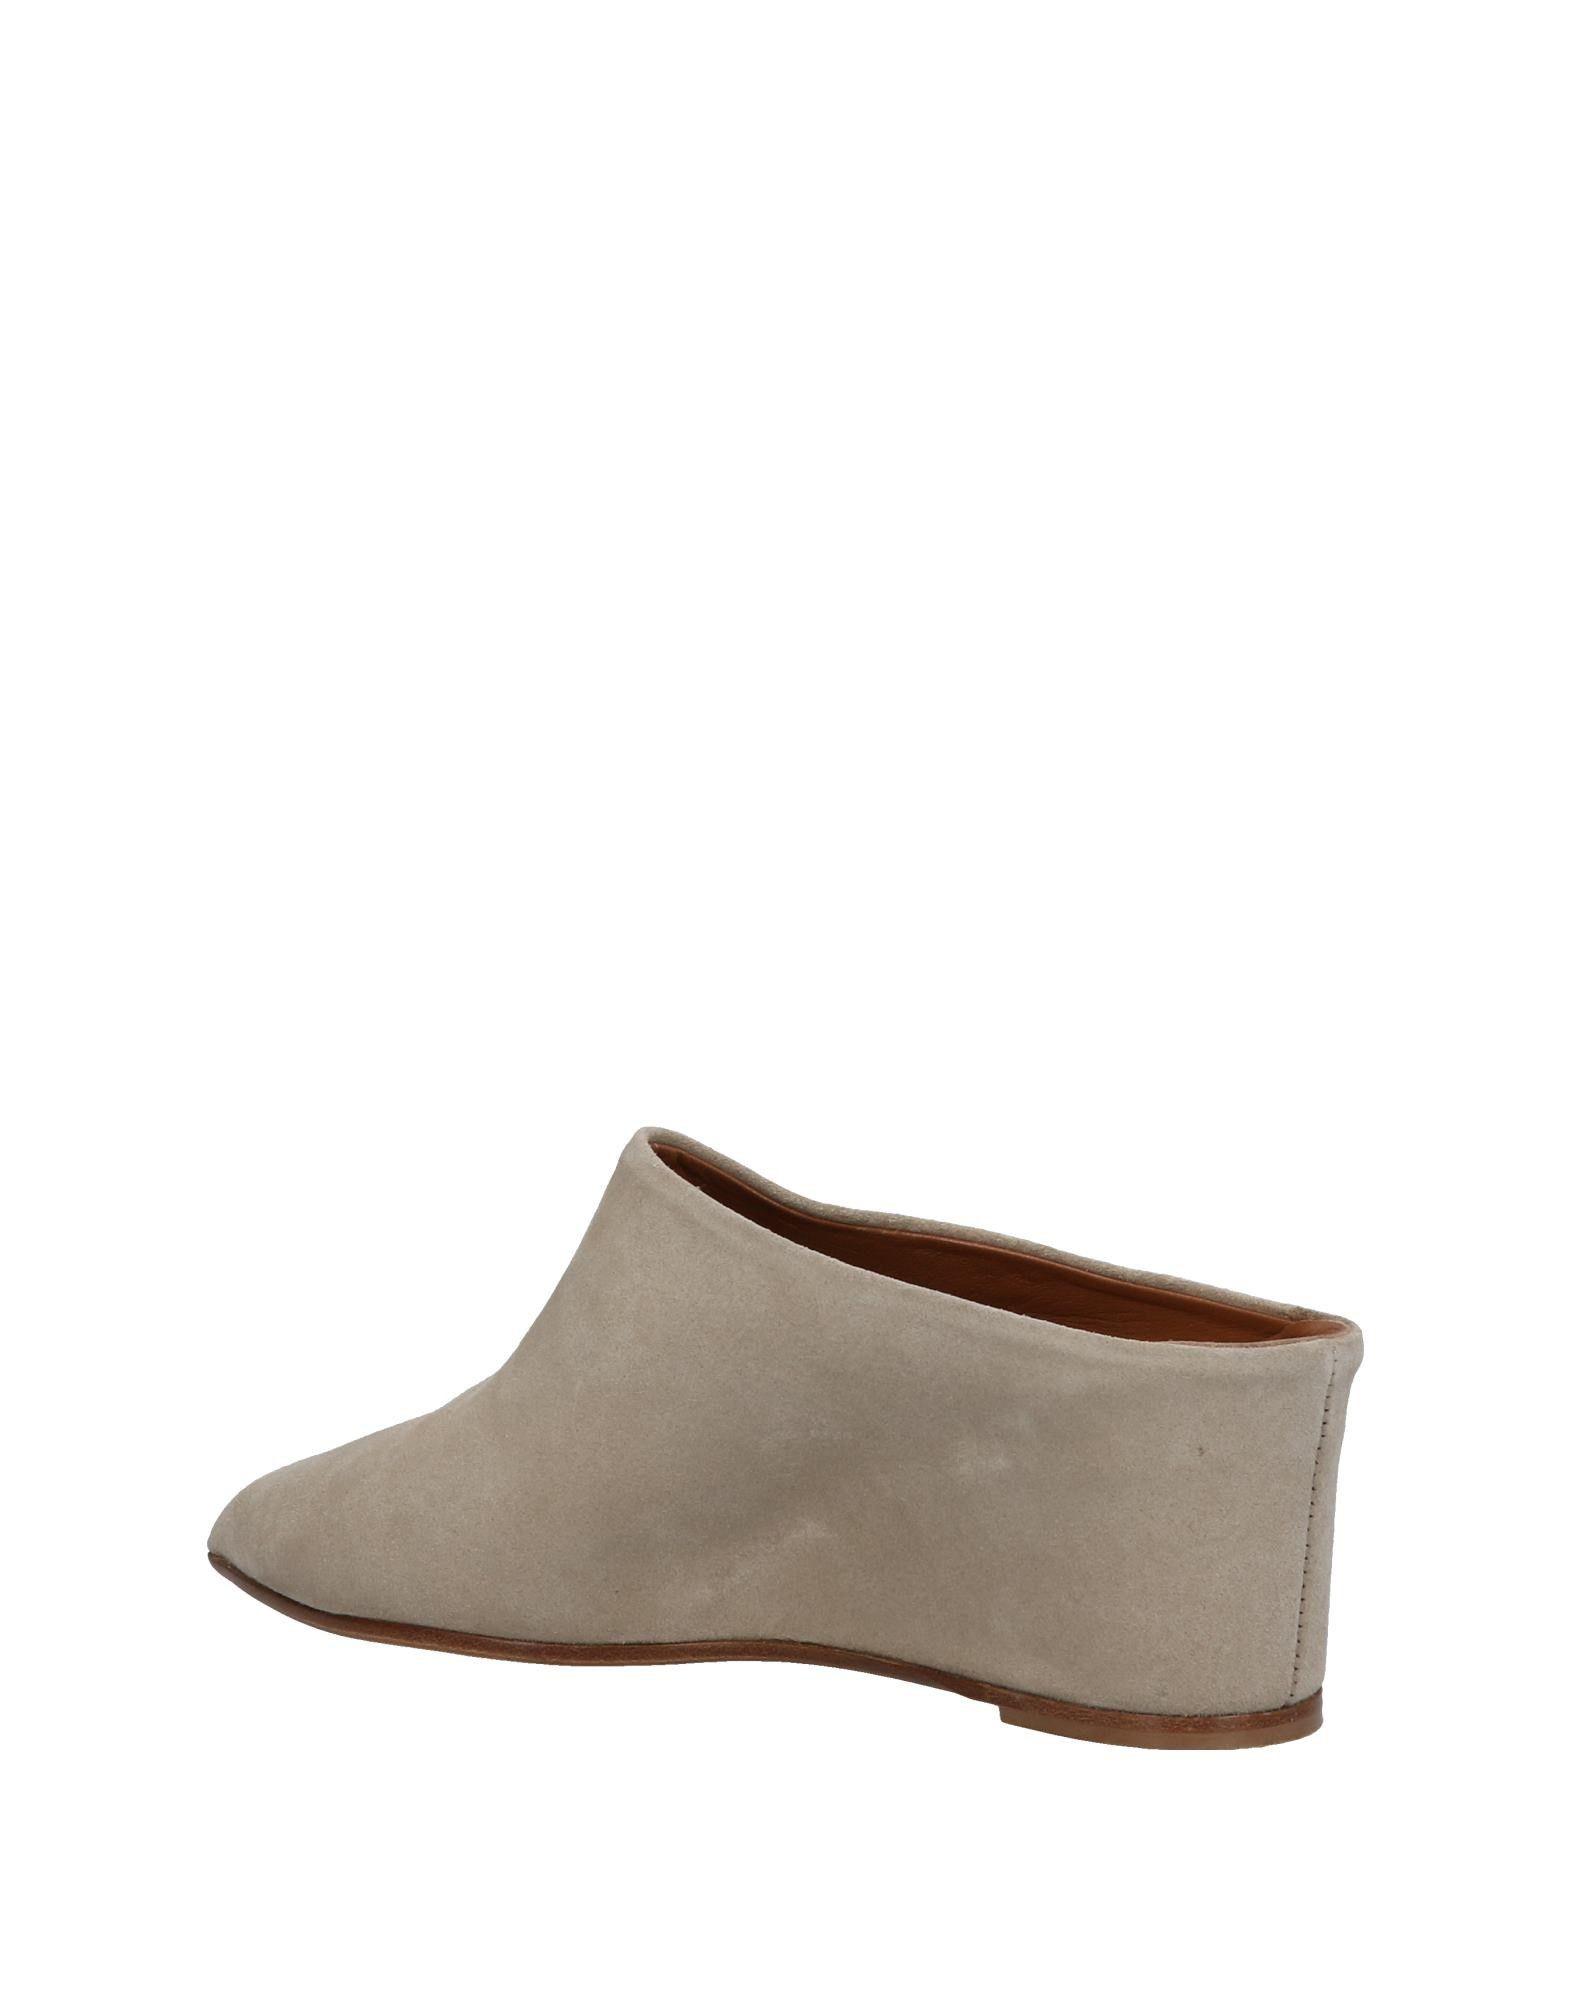 Atp Atelier Pantoletten Damen  11424843AF Gute Qualität beliebte Schuhe